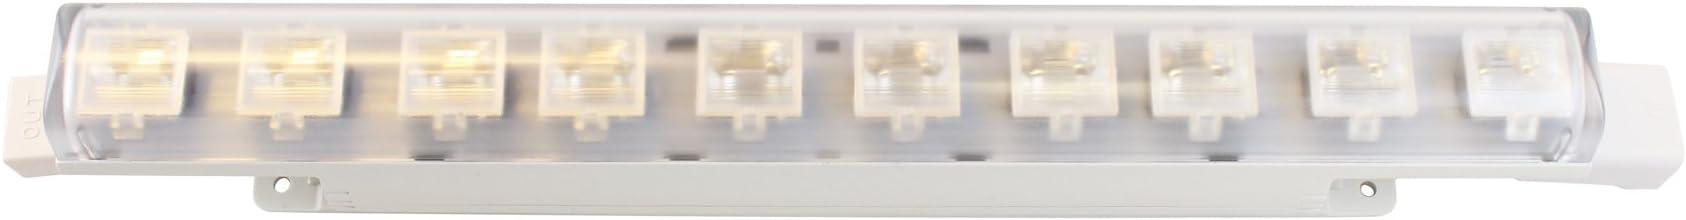 "12"" PHILIPS COLOR KINETICS 523-000065-09 EW-FUSE POWERCORE LED 3000K"